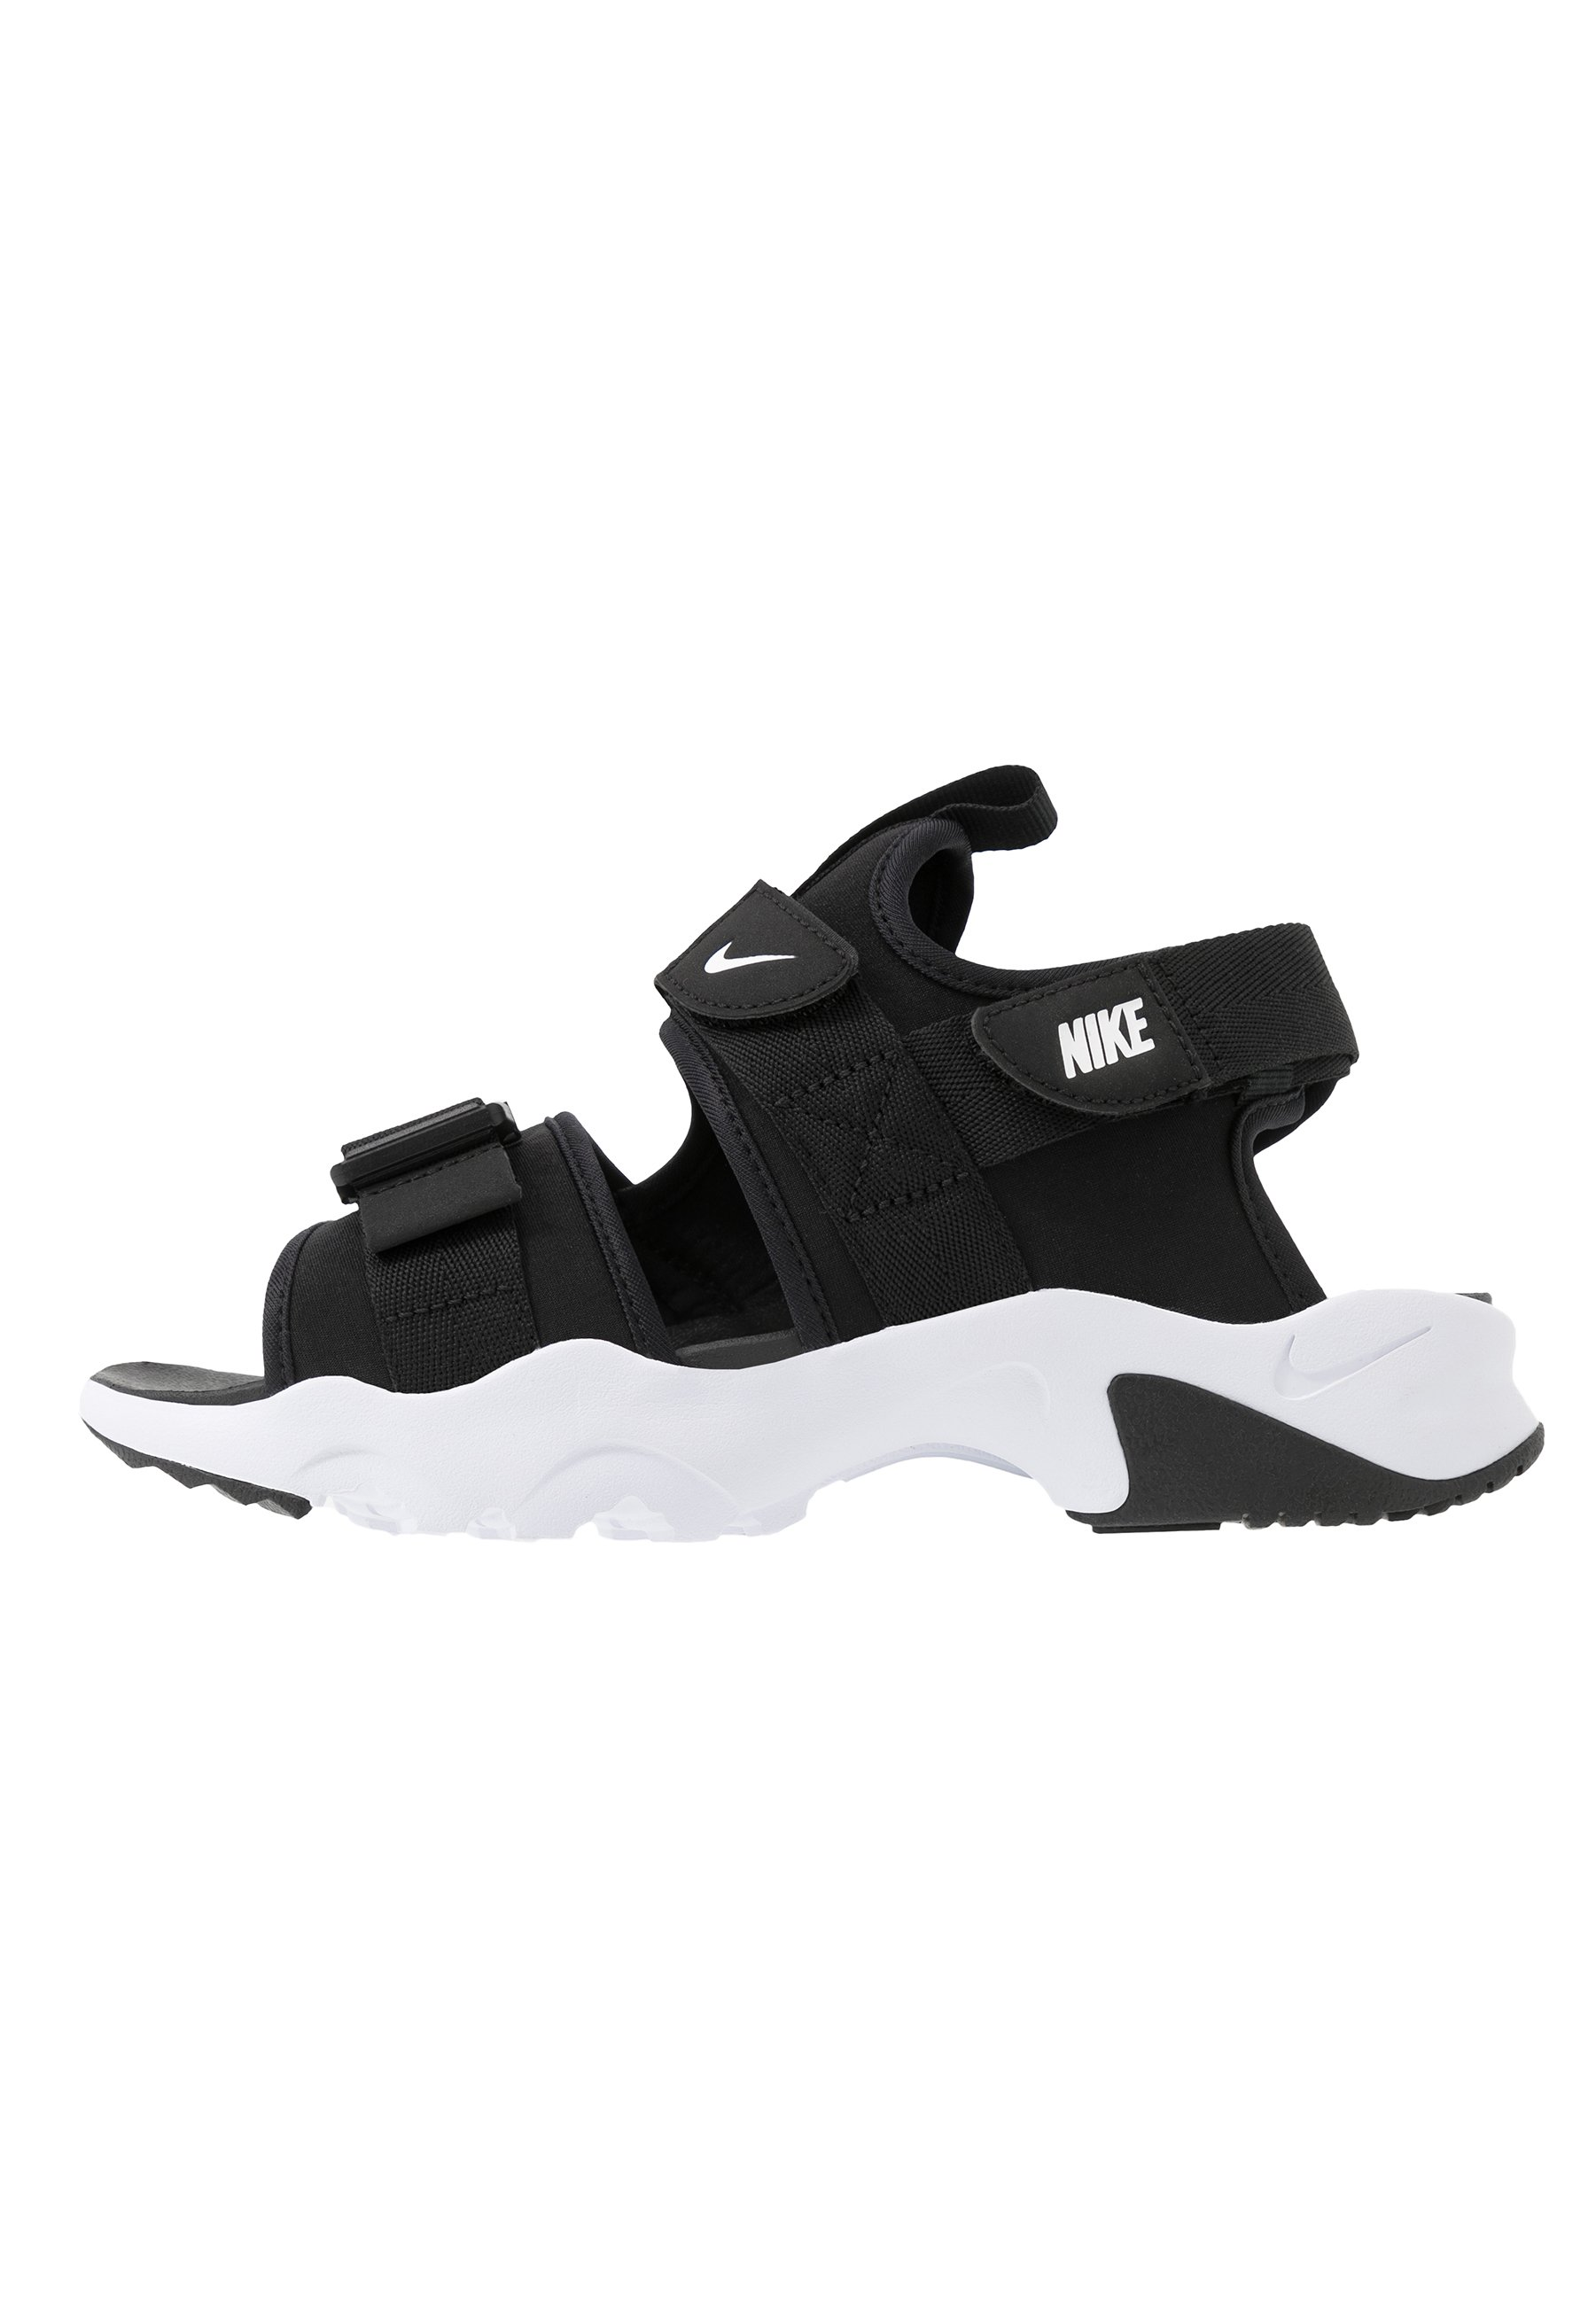 Nike Sportswear CANYON Tursandaler blackwhite Zalando.no